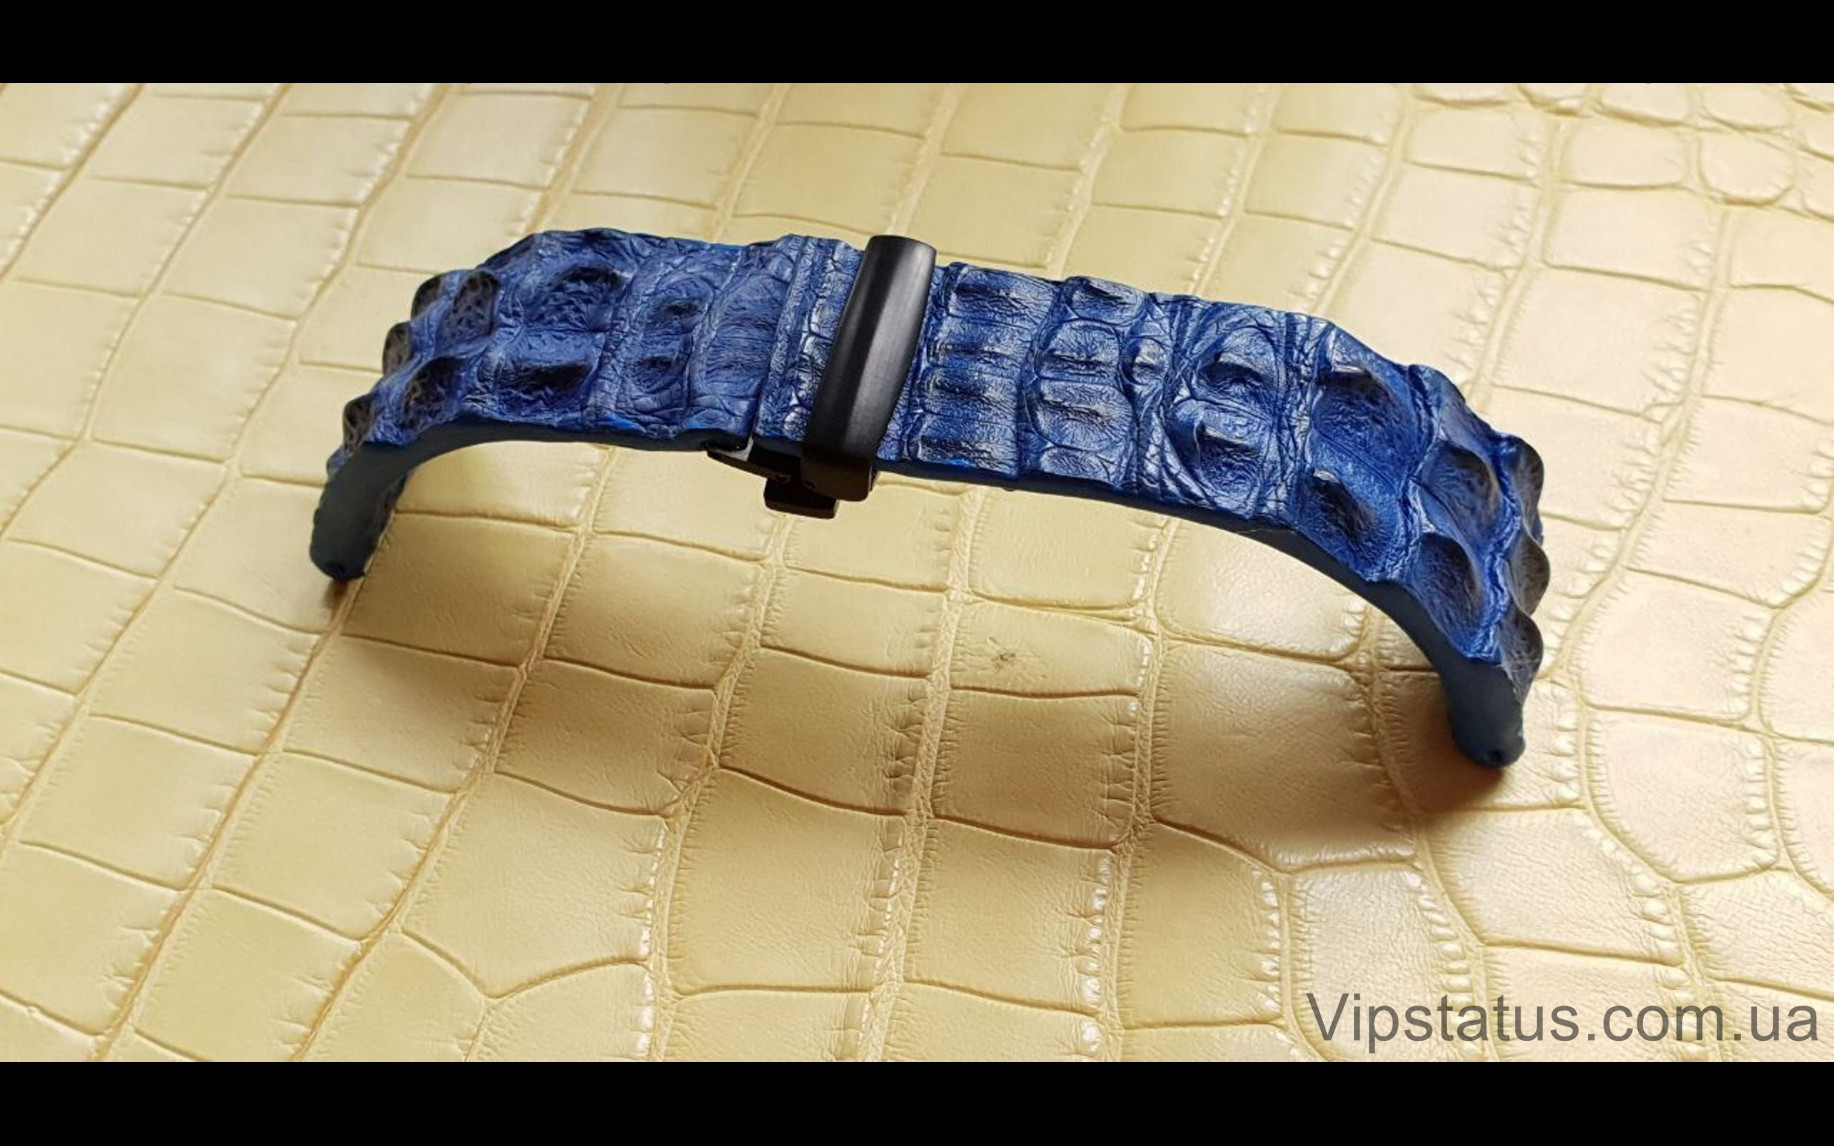 Elite Брутальный ремешок для часов TAG Heuer кожа крокодила Brutal Crocodile Strap for TAG Heuer watches image 1